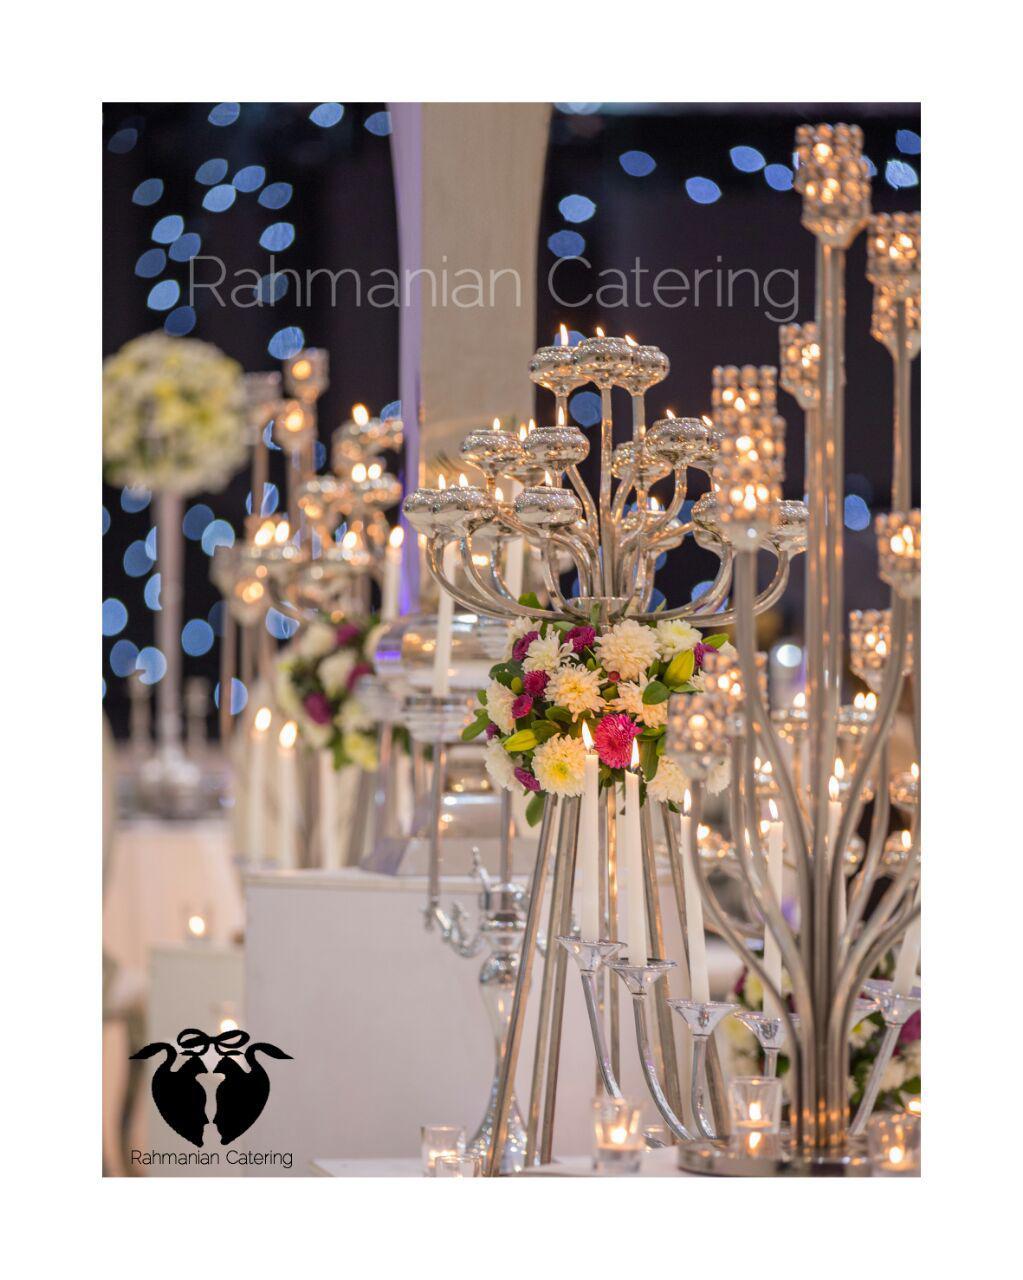 تشریفات رحمانیان   نورپردازی عروسی